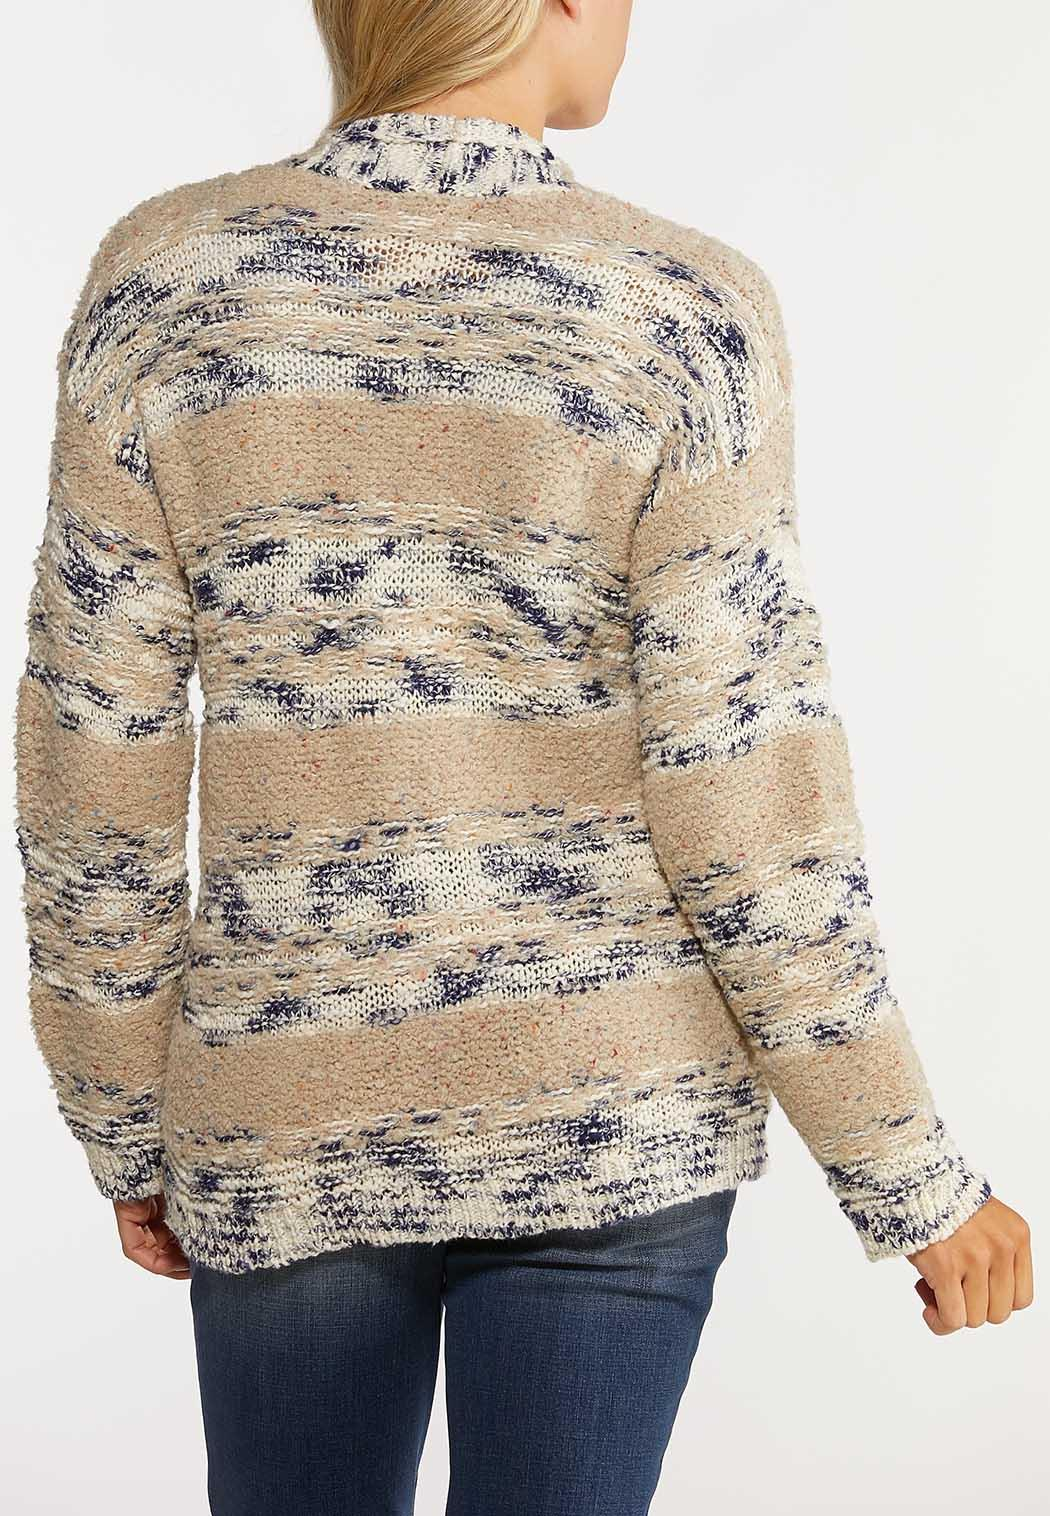 Plus Size Neutral Navy Cardigan Sweater (Item #44064132)